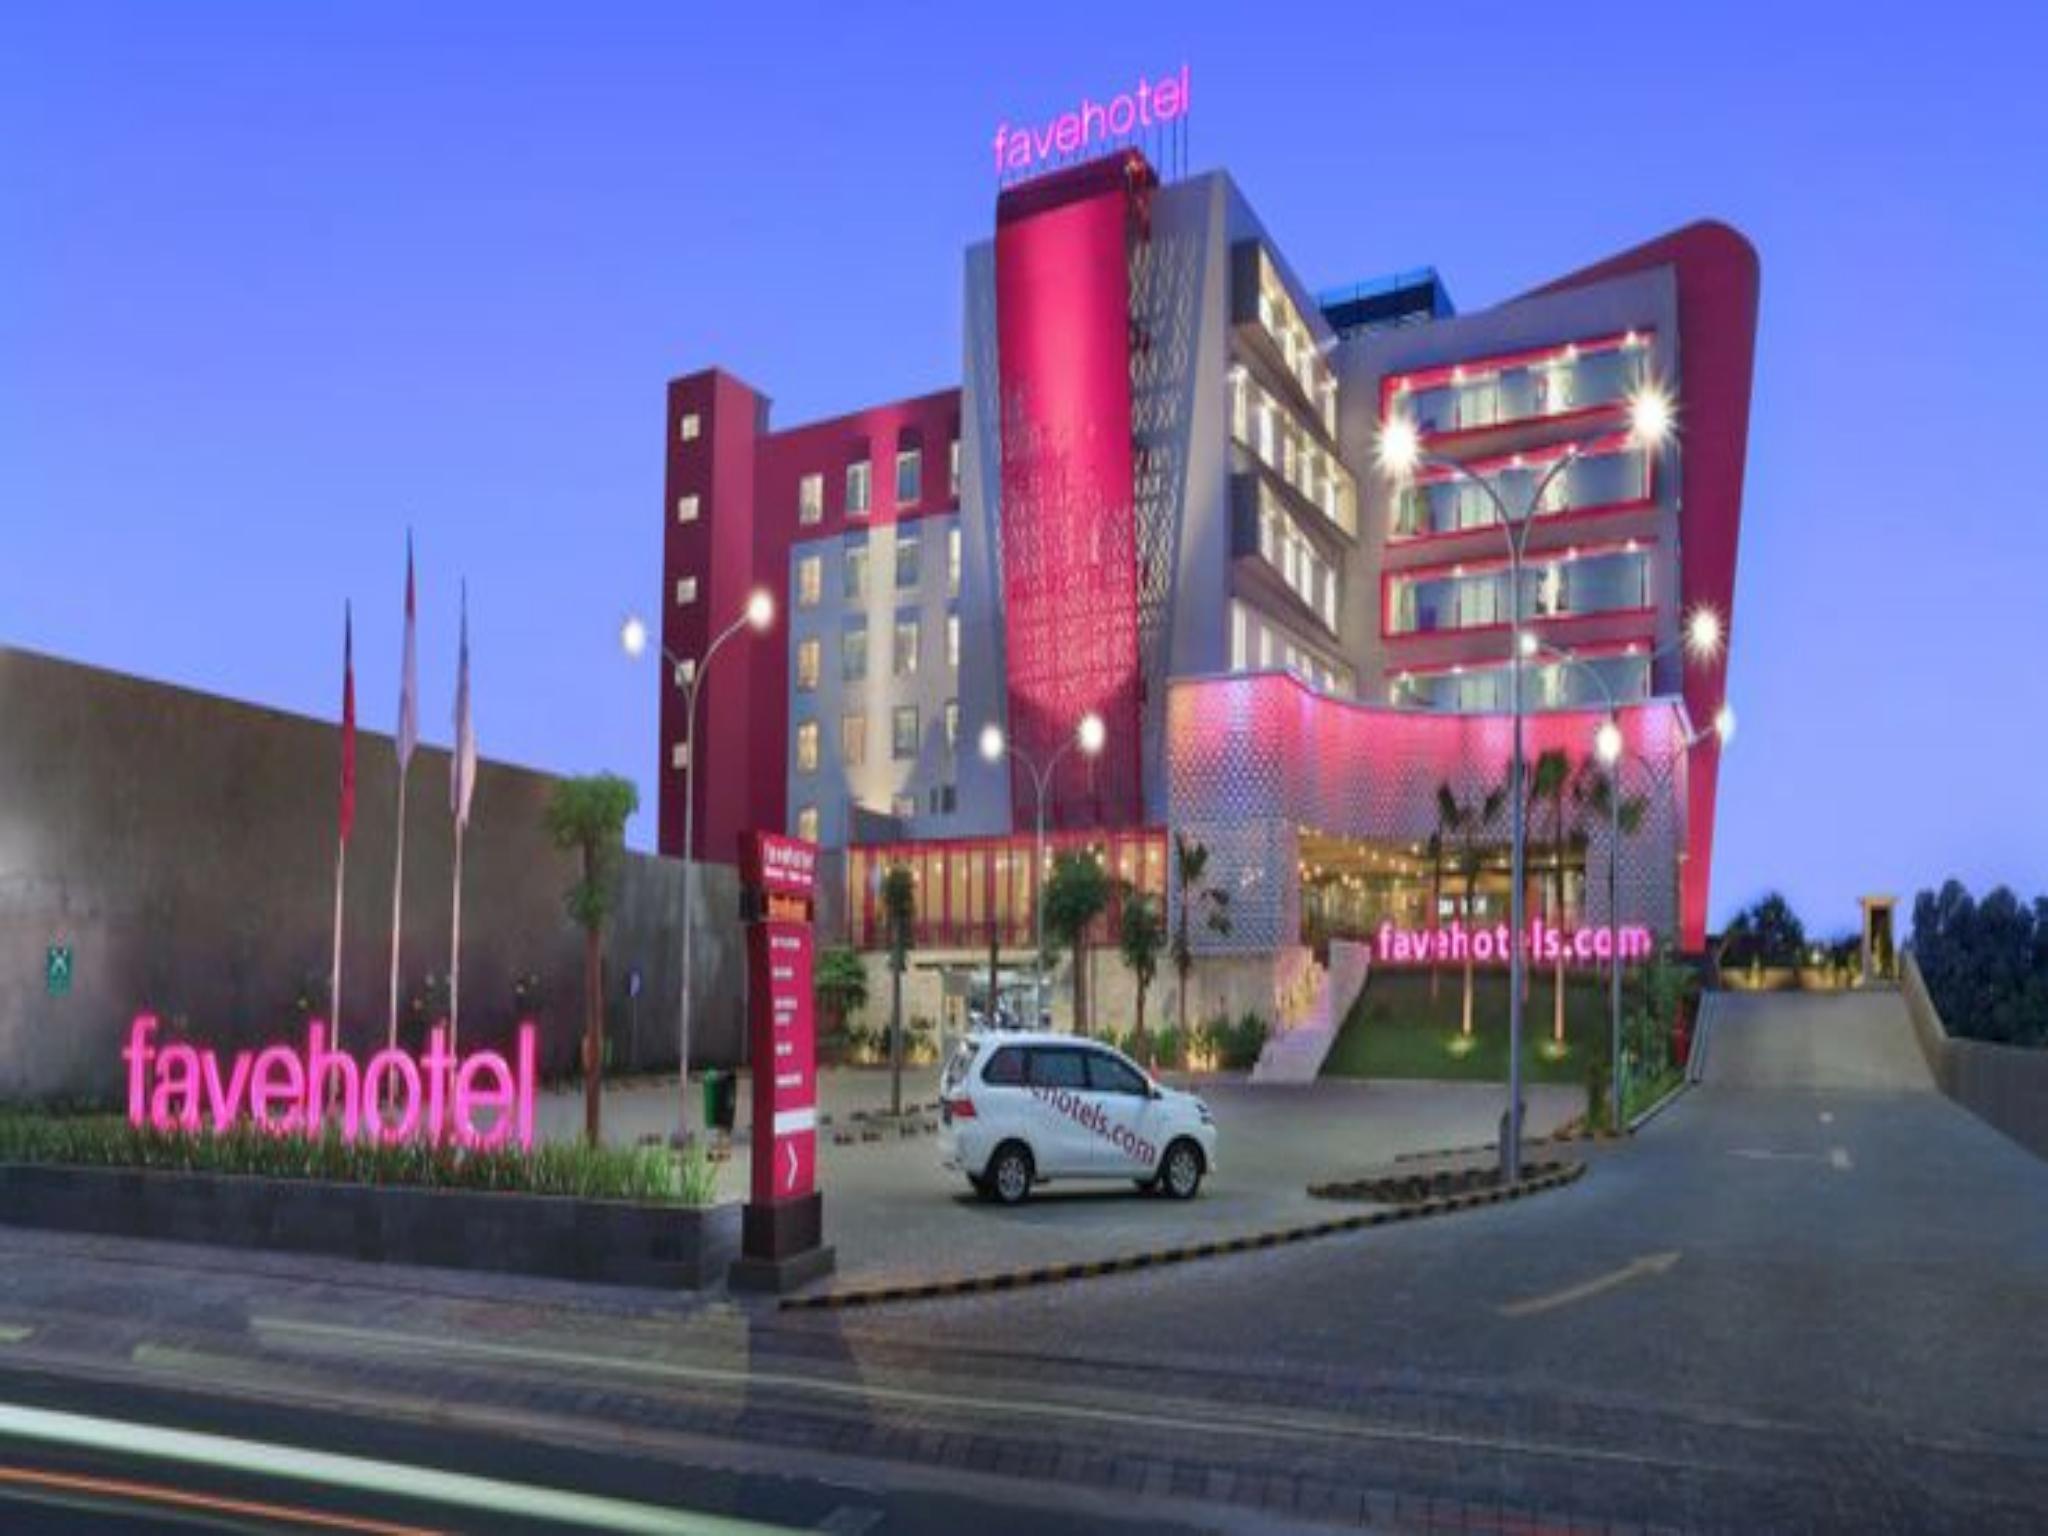 Favehotel Sidoarjo Surabaya Promo Terbaru 2020 Rp 304298 Foto Hd Ulasan